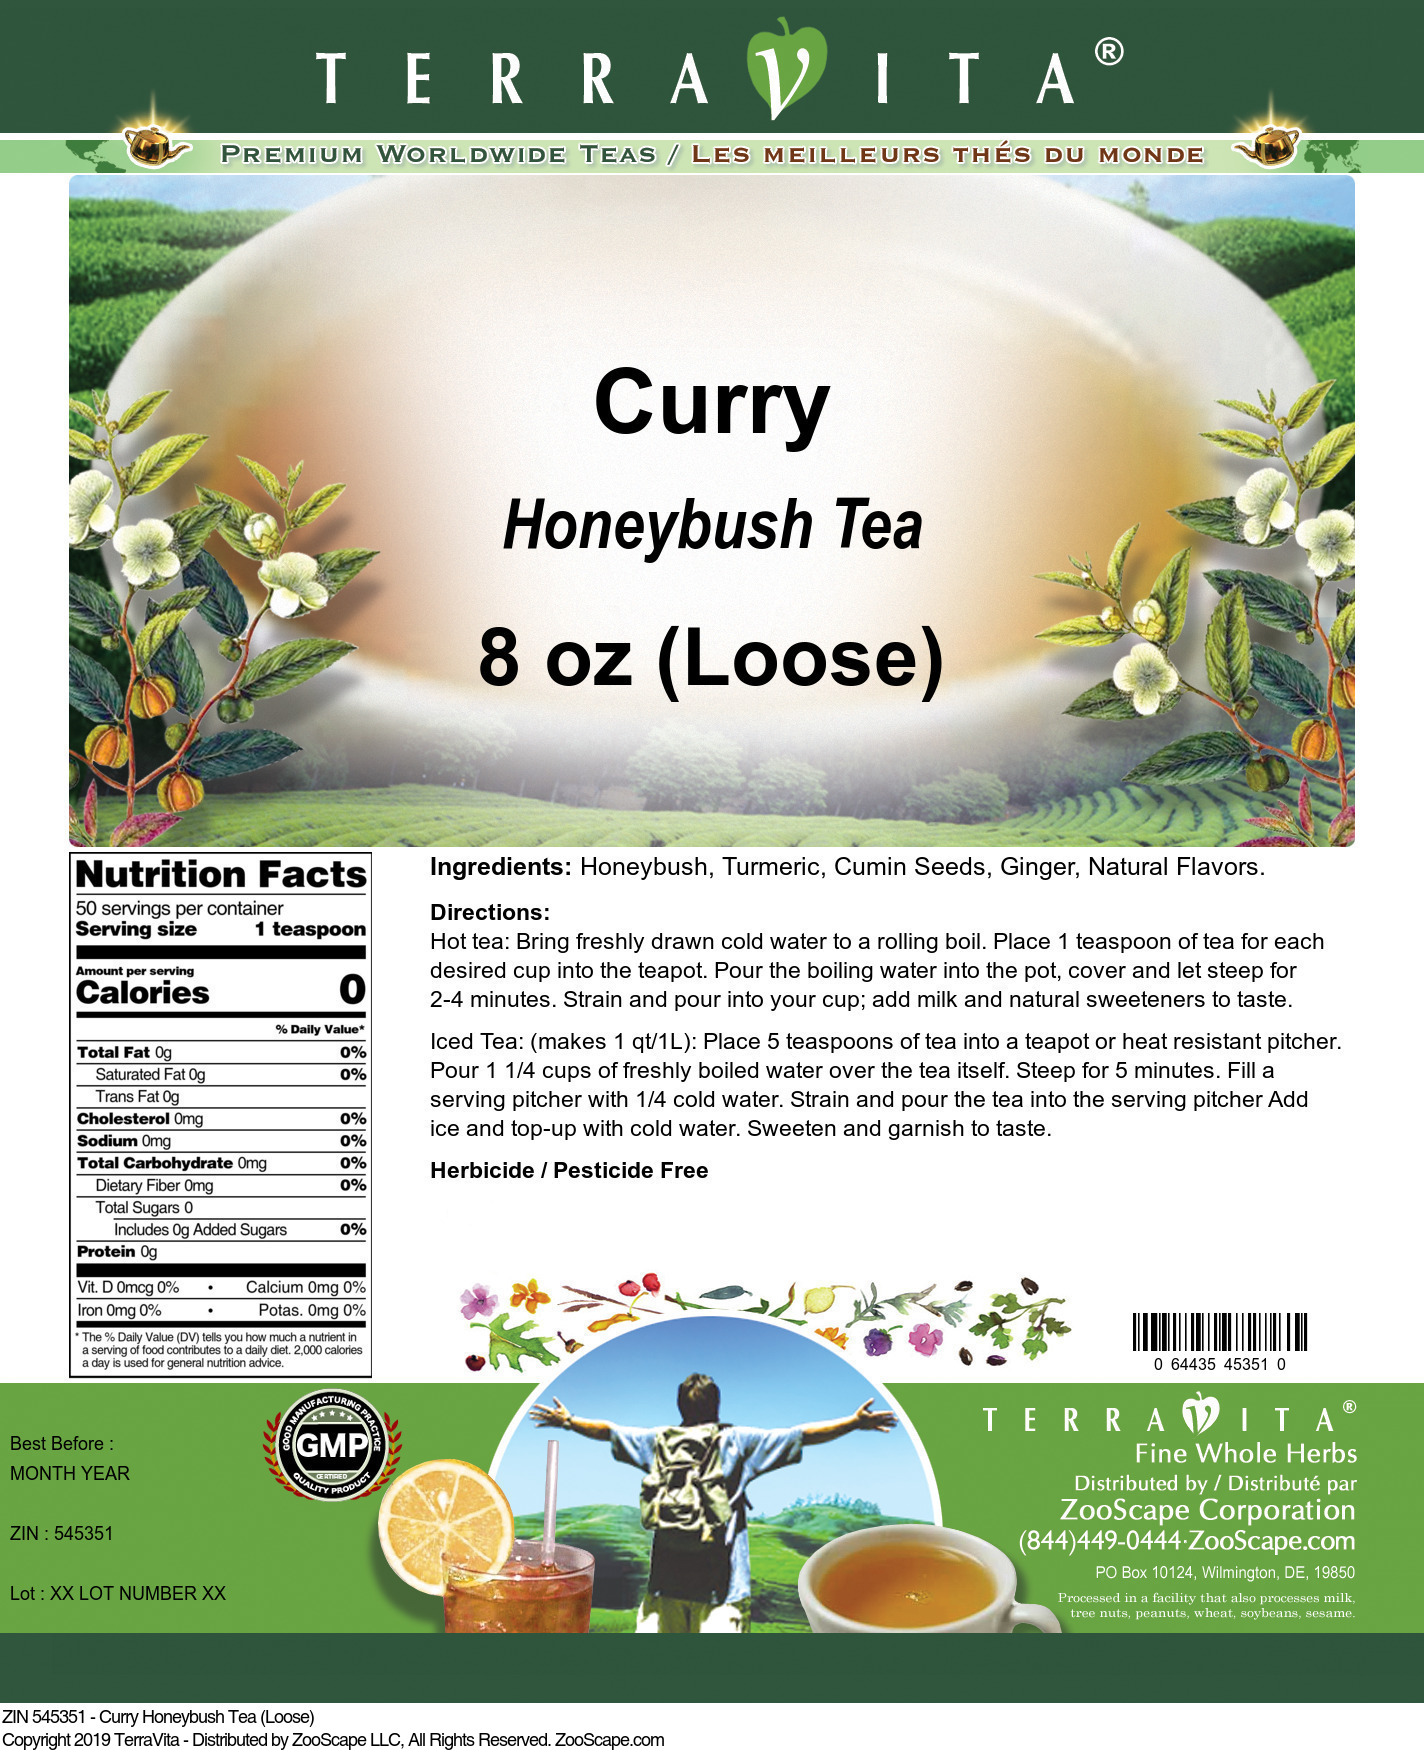 Curry Honeybush Tea